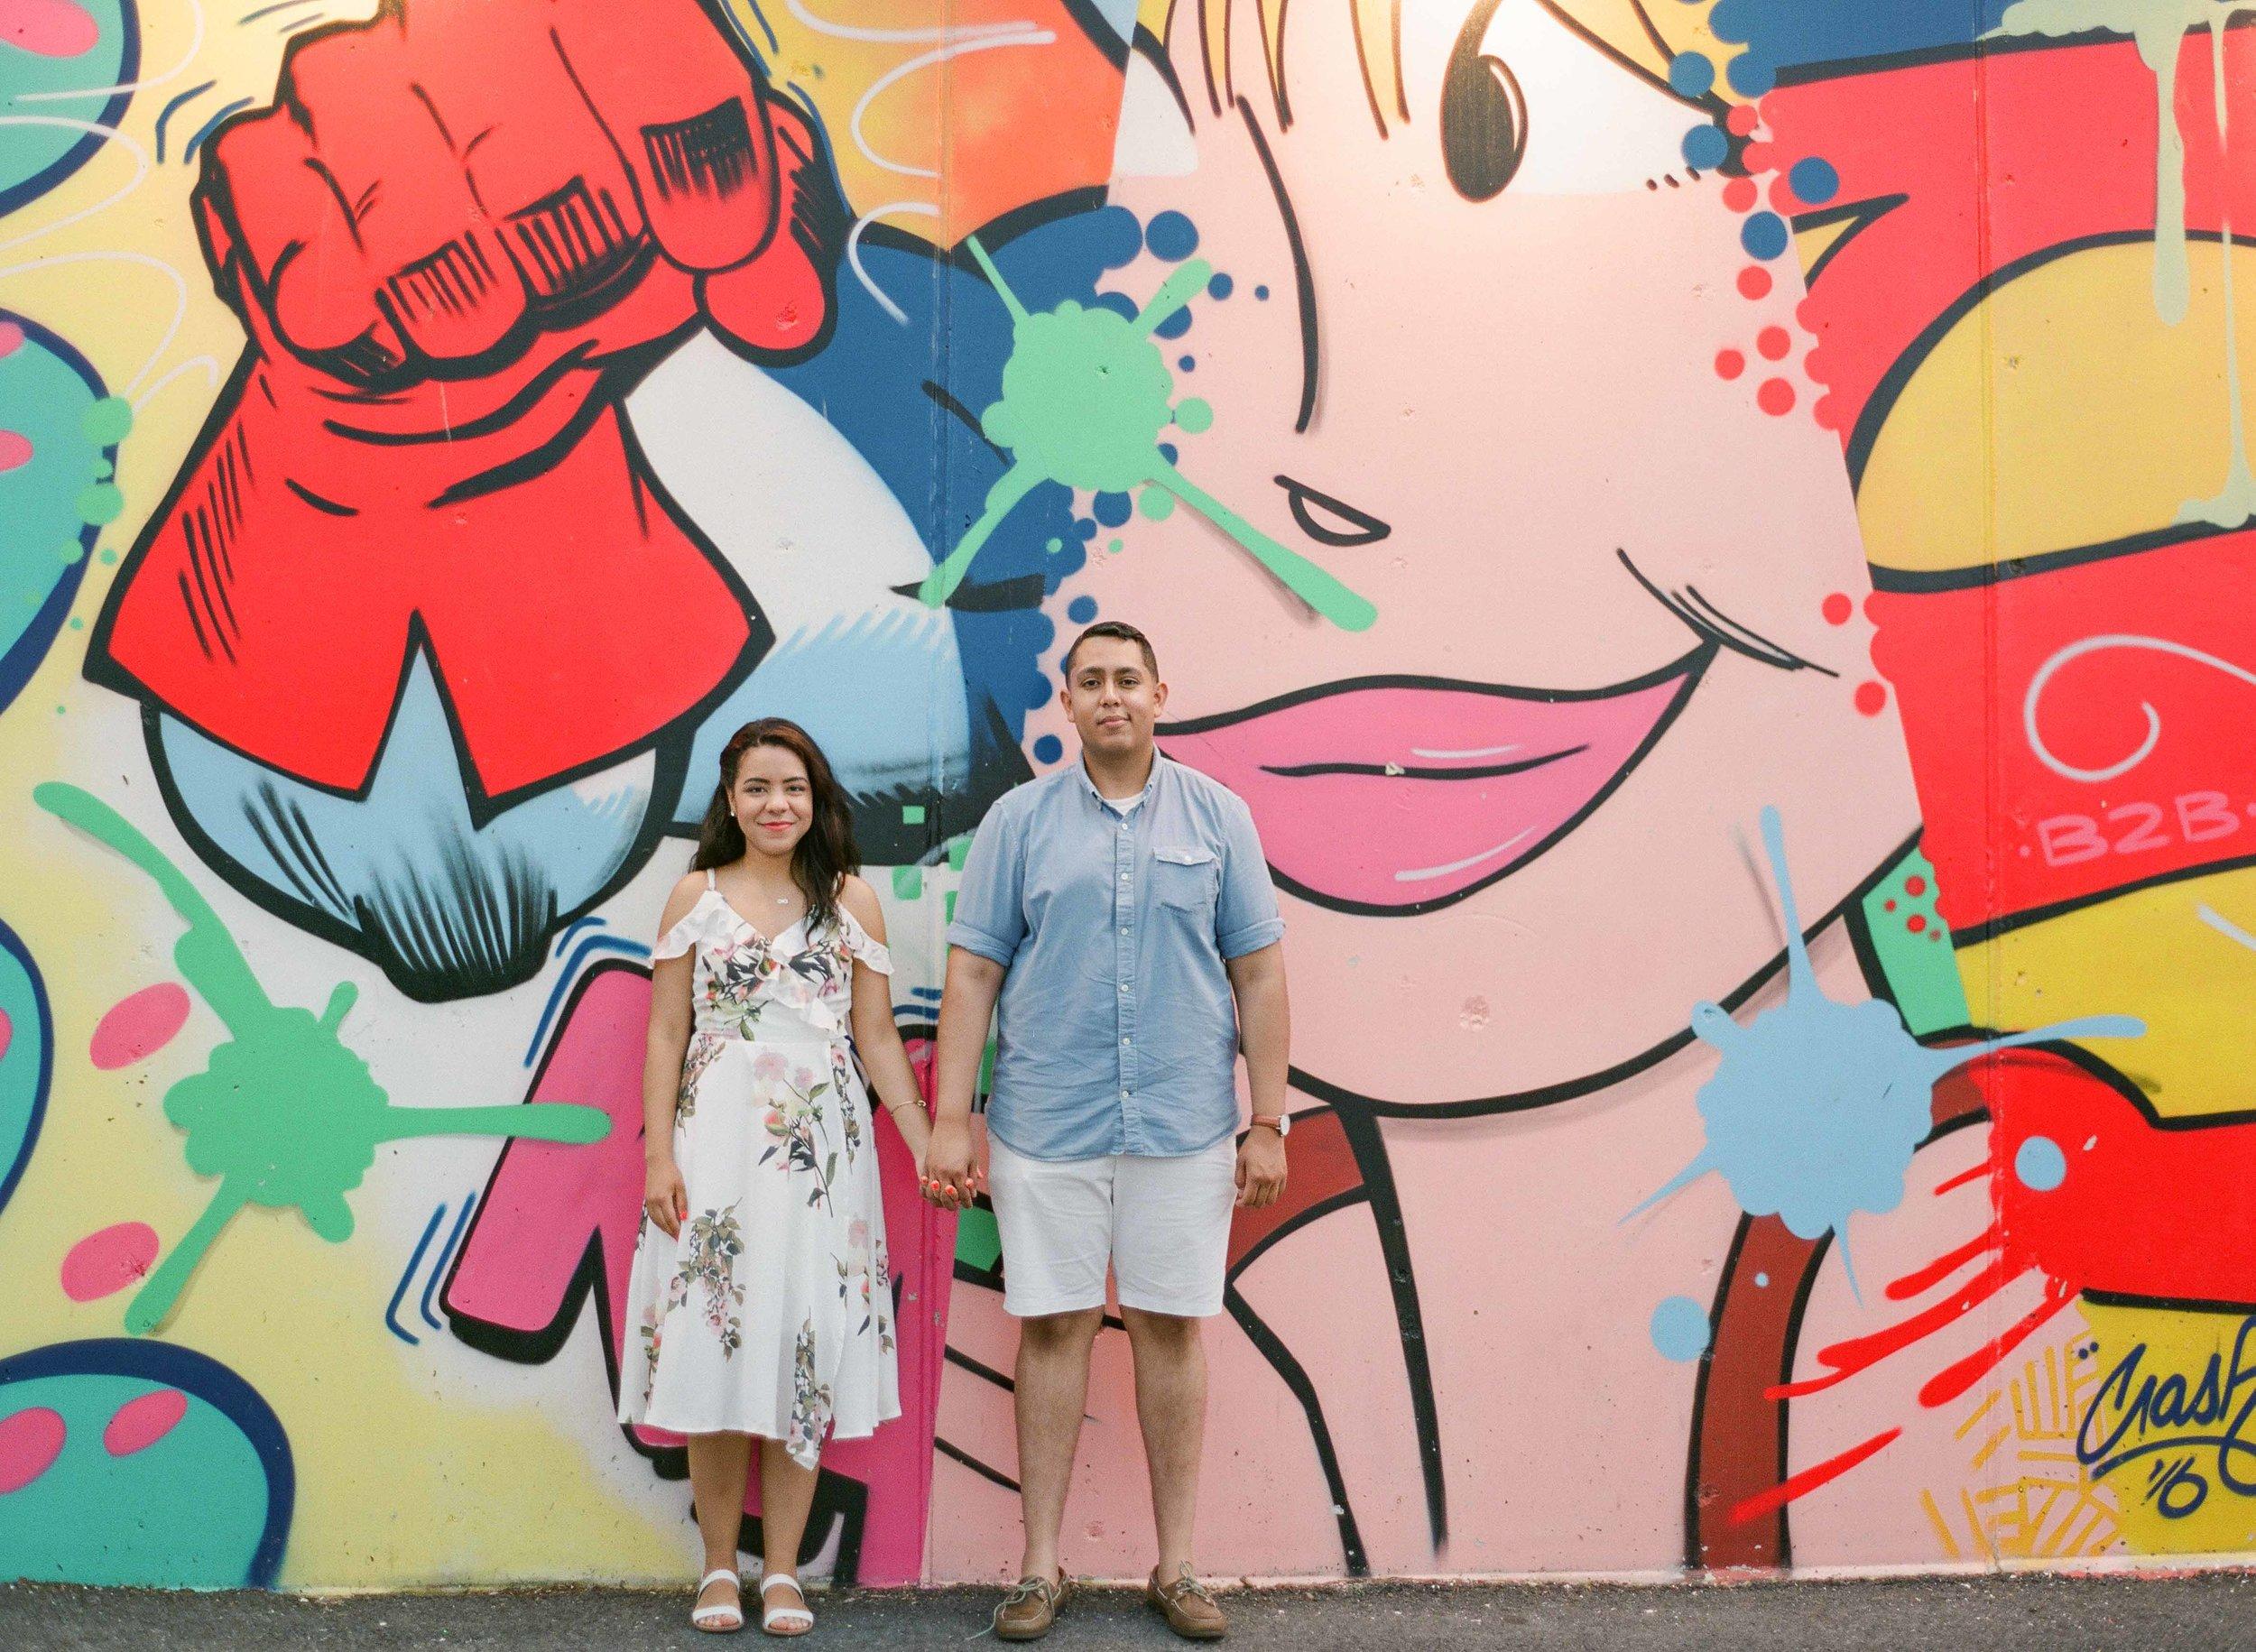 44_coney-island-murals.jpg